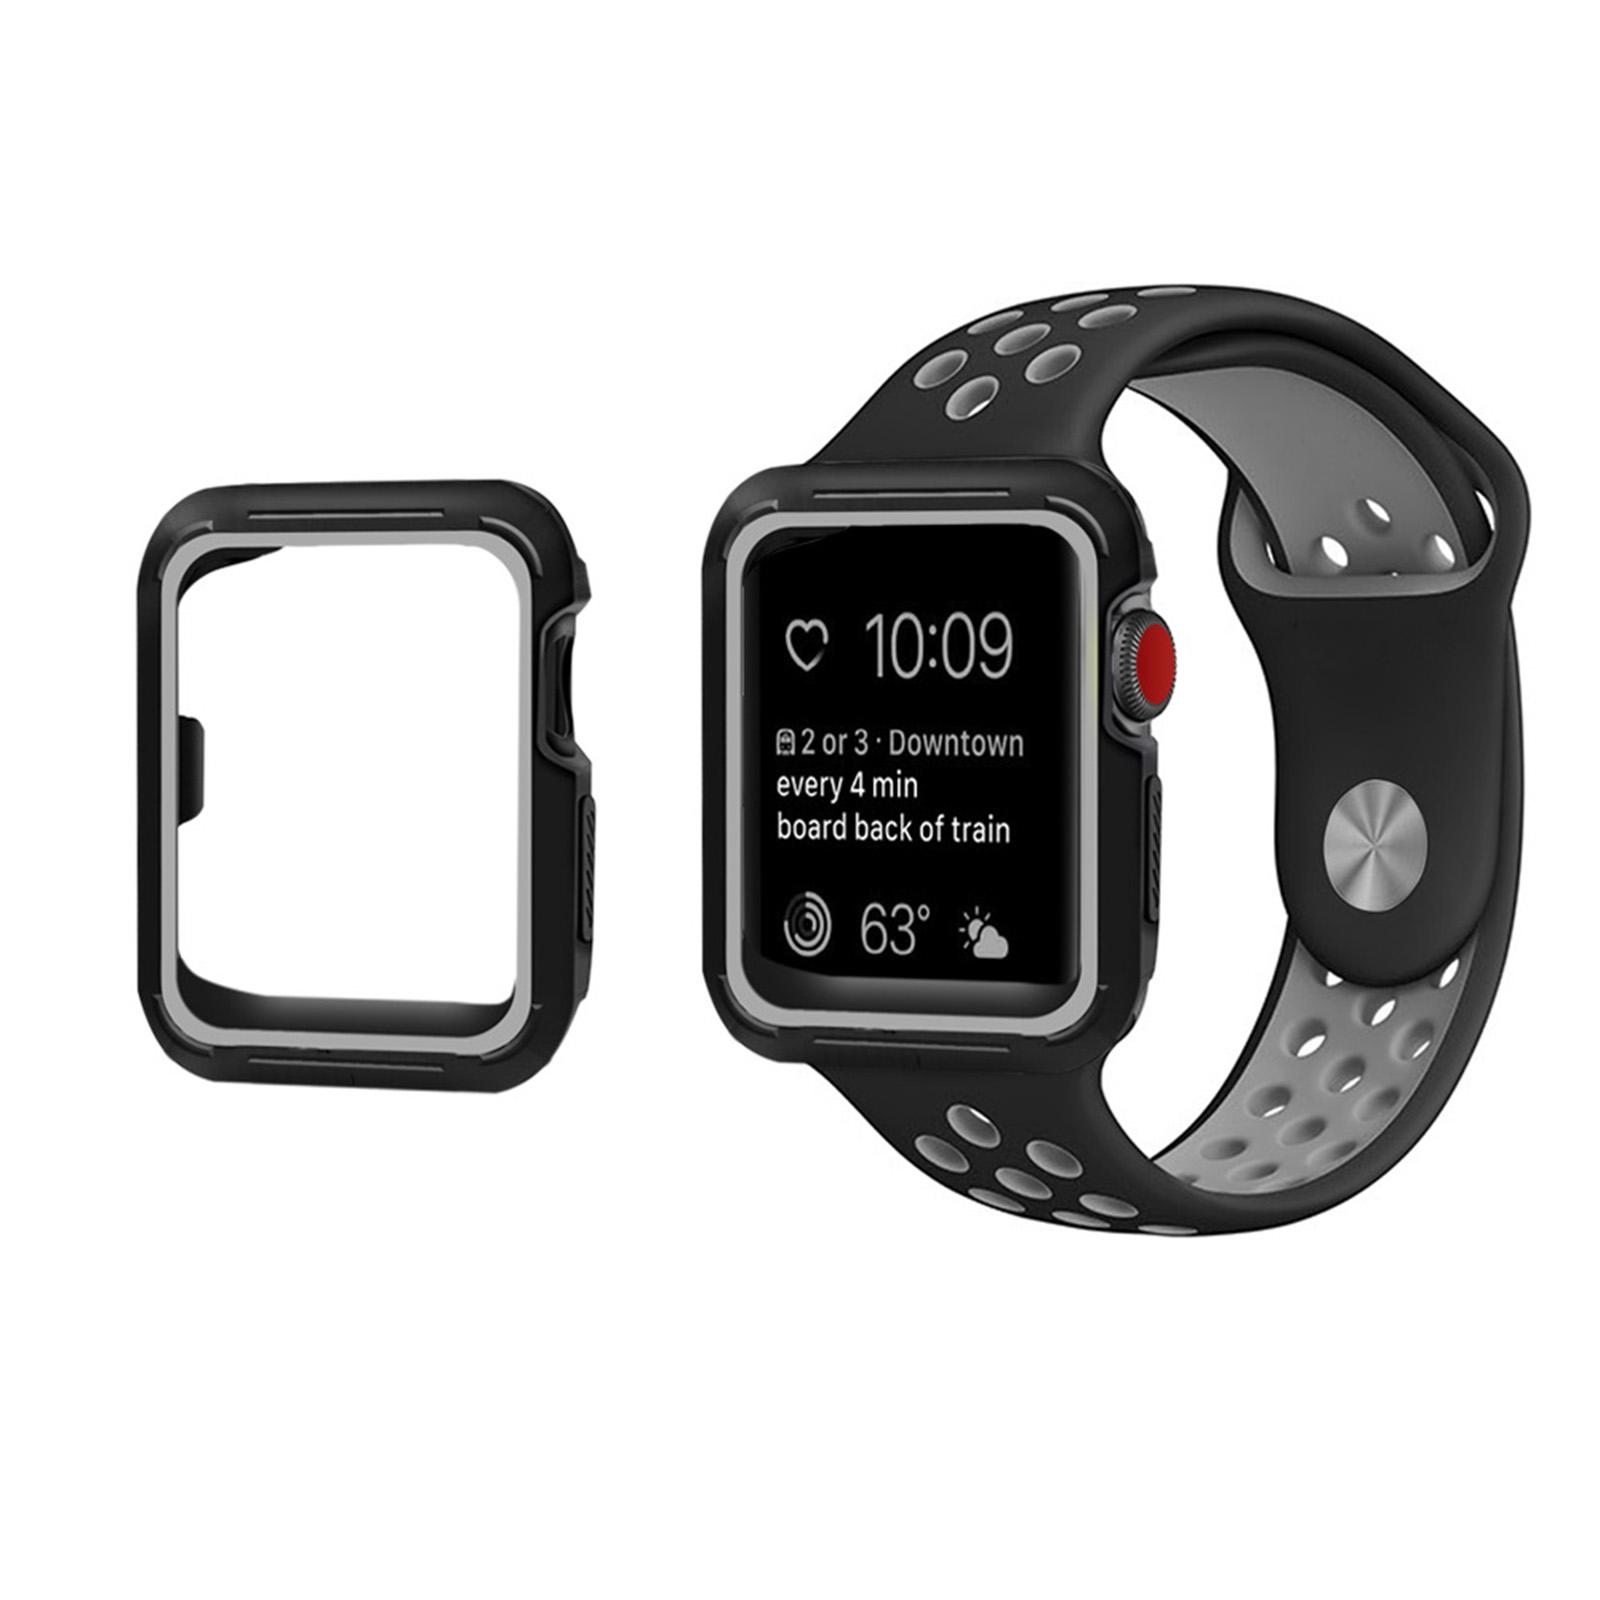 2648b33b88e TPU Bumper iWatch Screen Protector Case Cover 38 42 For Apple Watch ...